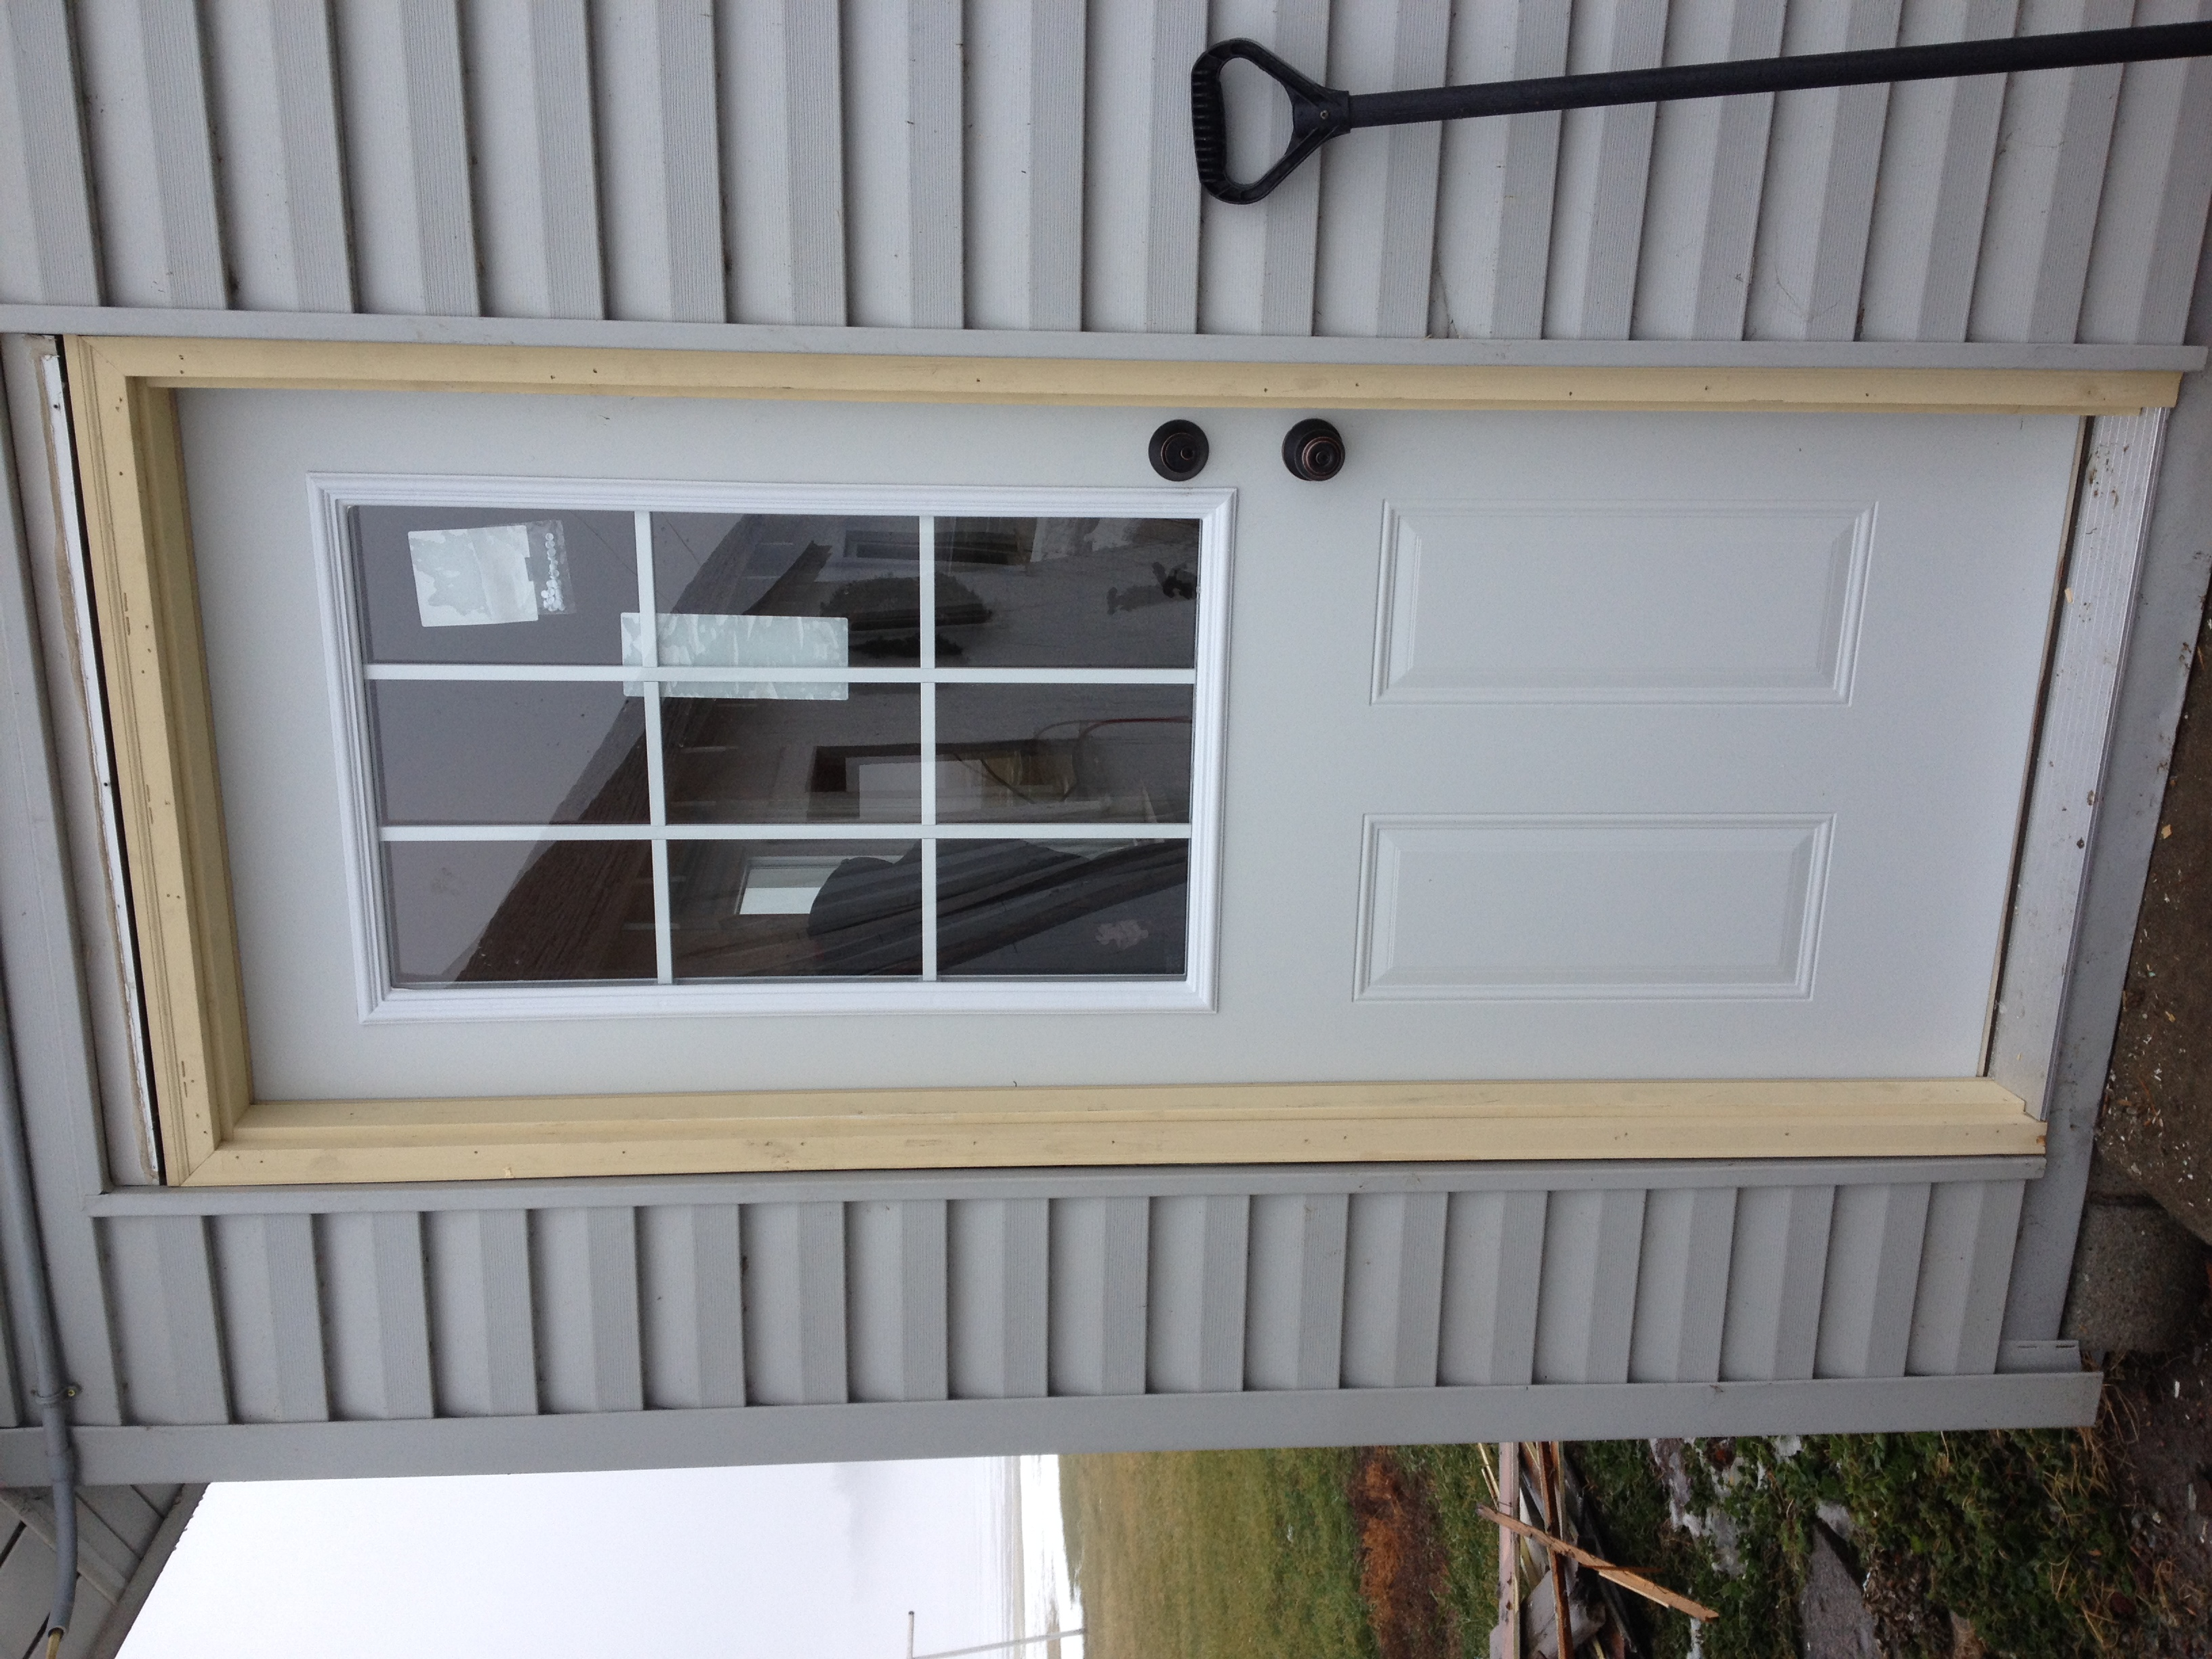 2448 #806D4B Exterior Doors At Menards Standard Sized Storm Screen Doors At Menards  picture/photo Menards Storm Doors Exterior 41493264